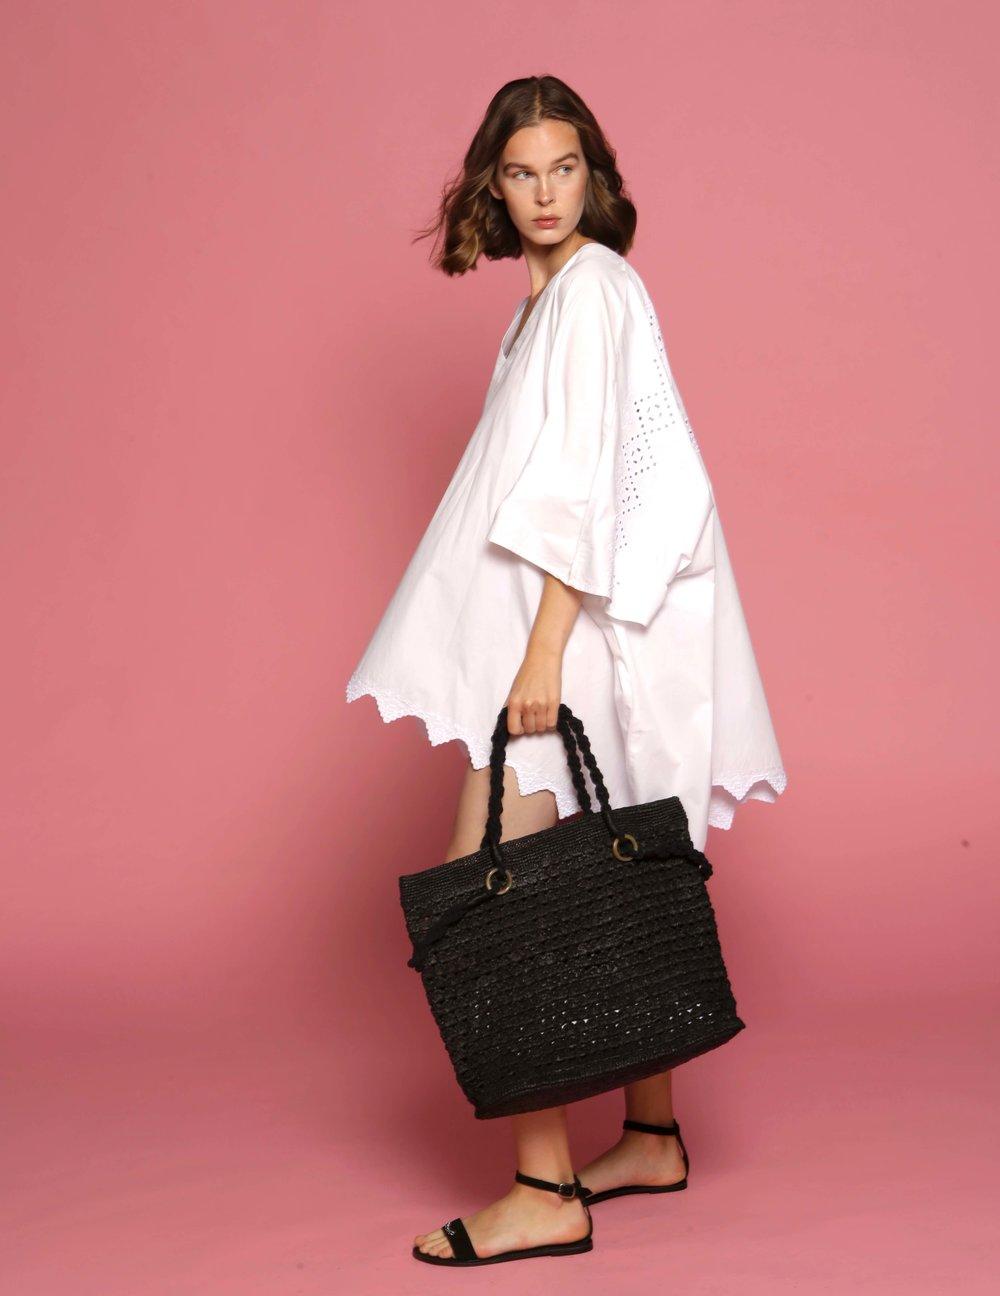 cover up dress fitia and beach bag tara.jpeg